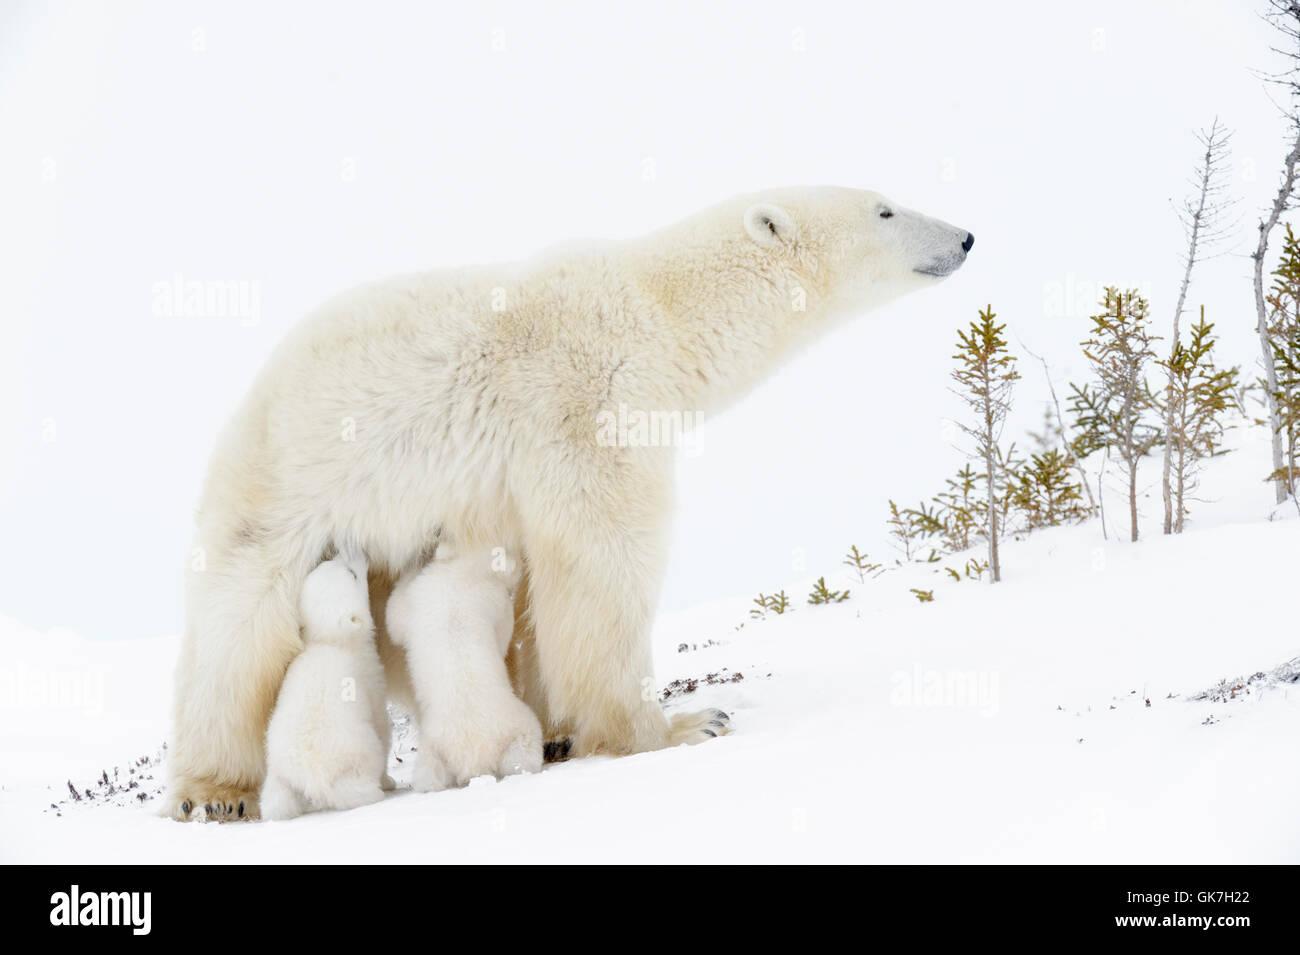 Polar bear mother (Ursus maritimus)standing up, nursing two new born cubs, Wapusk National Park, Manitoba, Canada - Stock Image